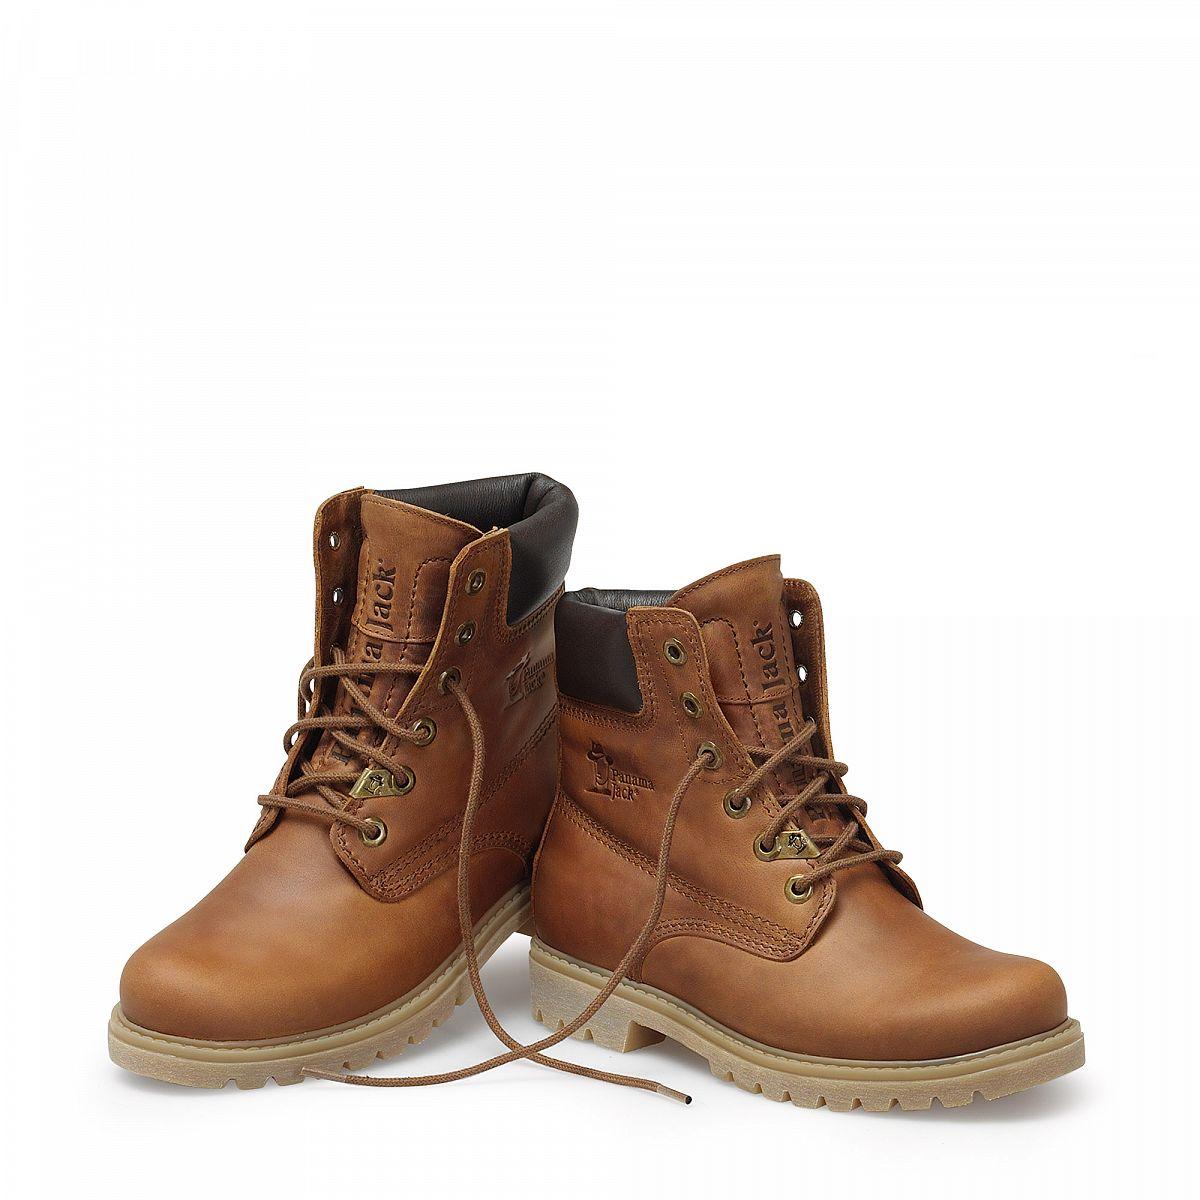 womens boots panama 03 bark panama jack online shop. Black Bedroom Furniture Sets. Home Design Ideas